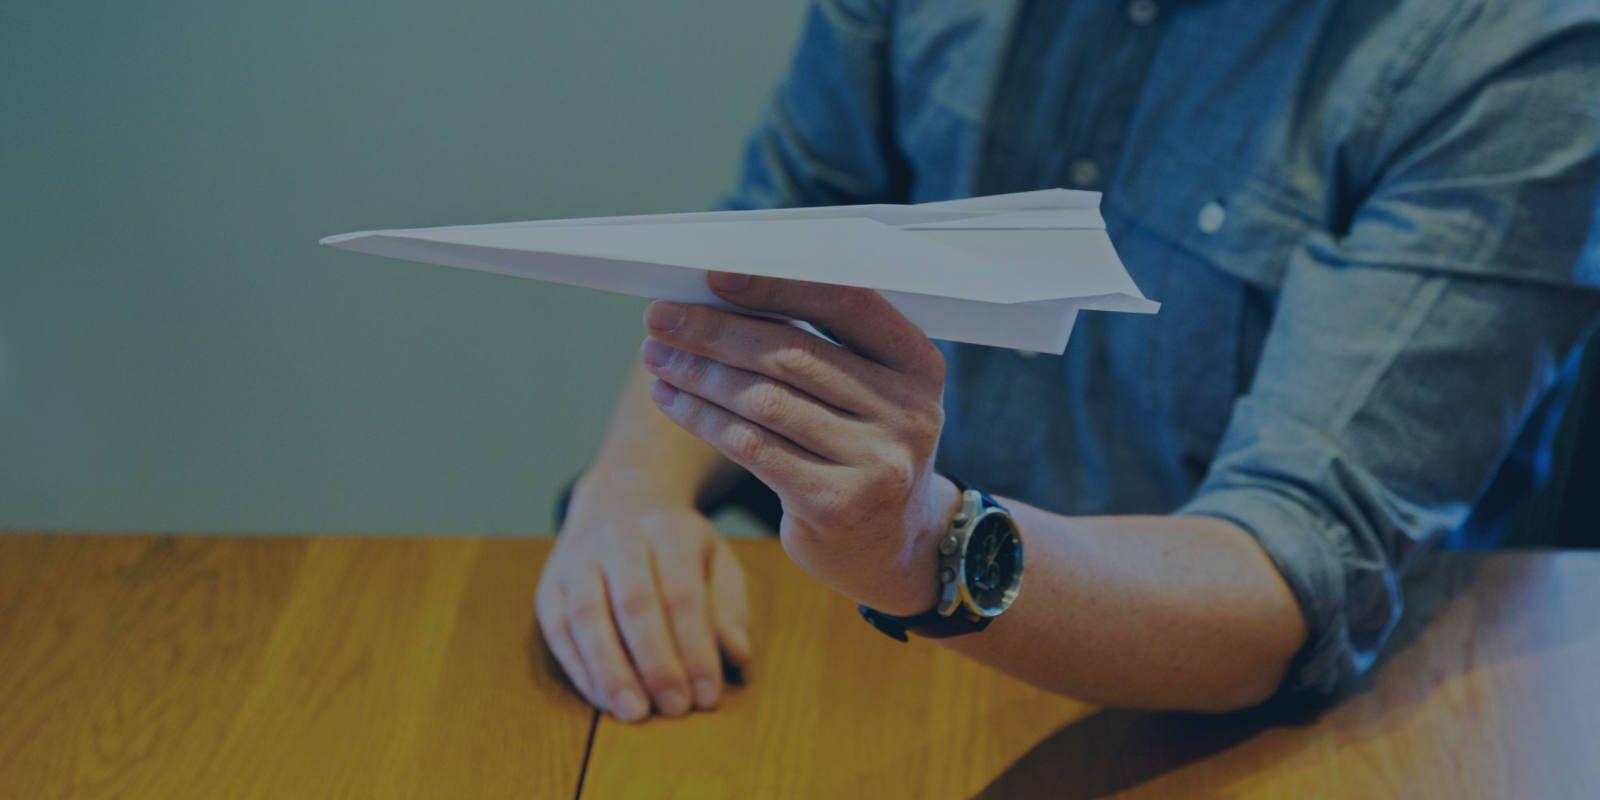 Matt Konen creating a paper airplane at the Big Storm office in Bozeman, MT